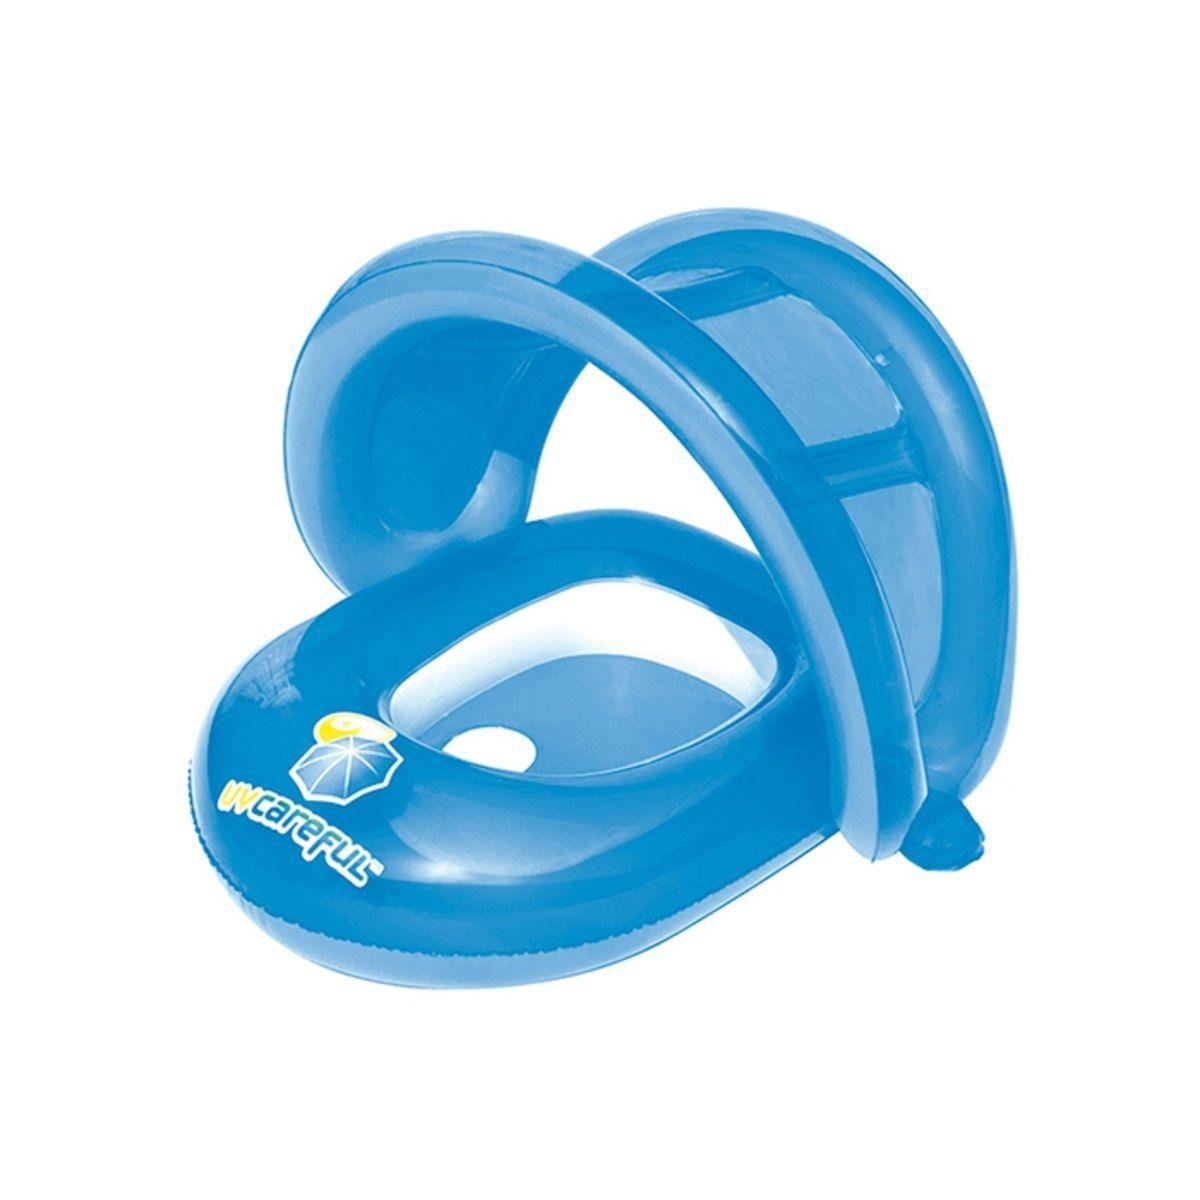 Bote Boia Inflavel Infantil com Cobertura Cuidados com o Bebe Bestway